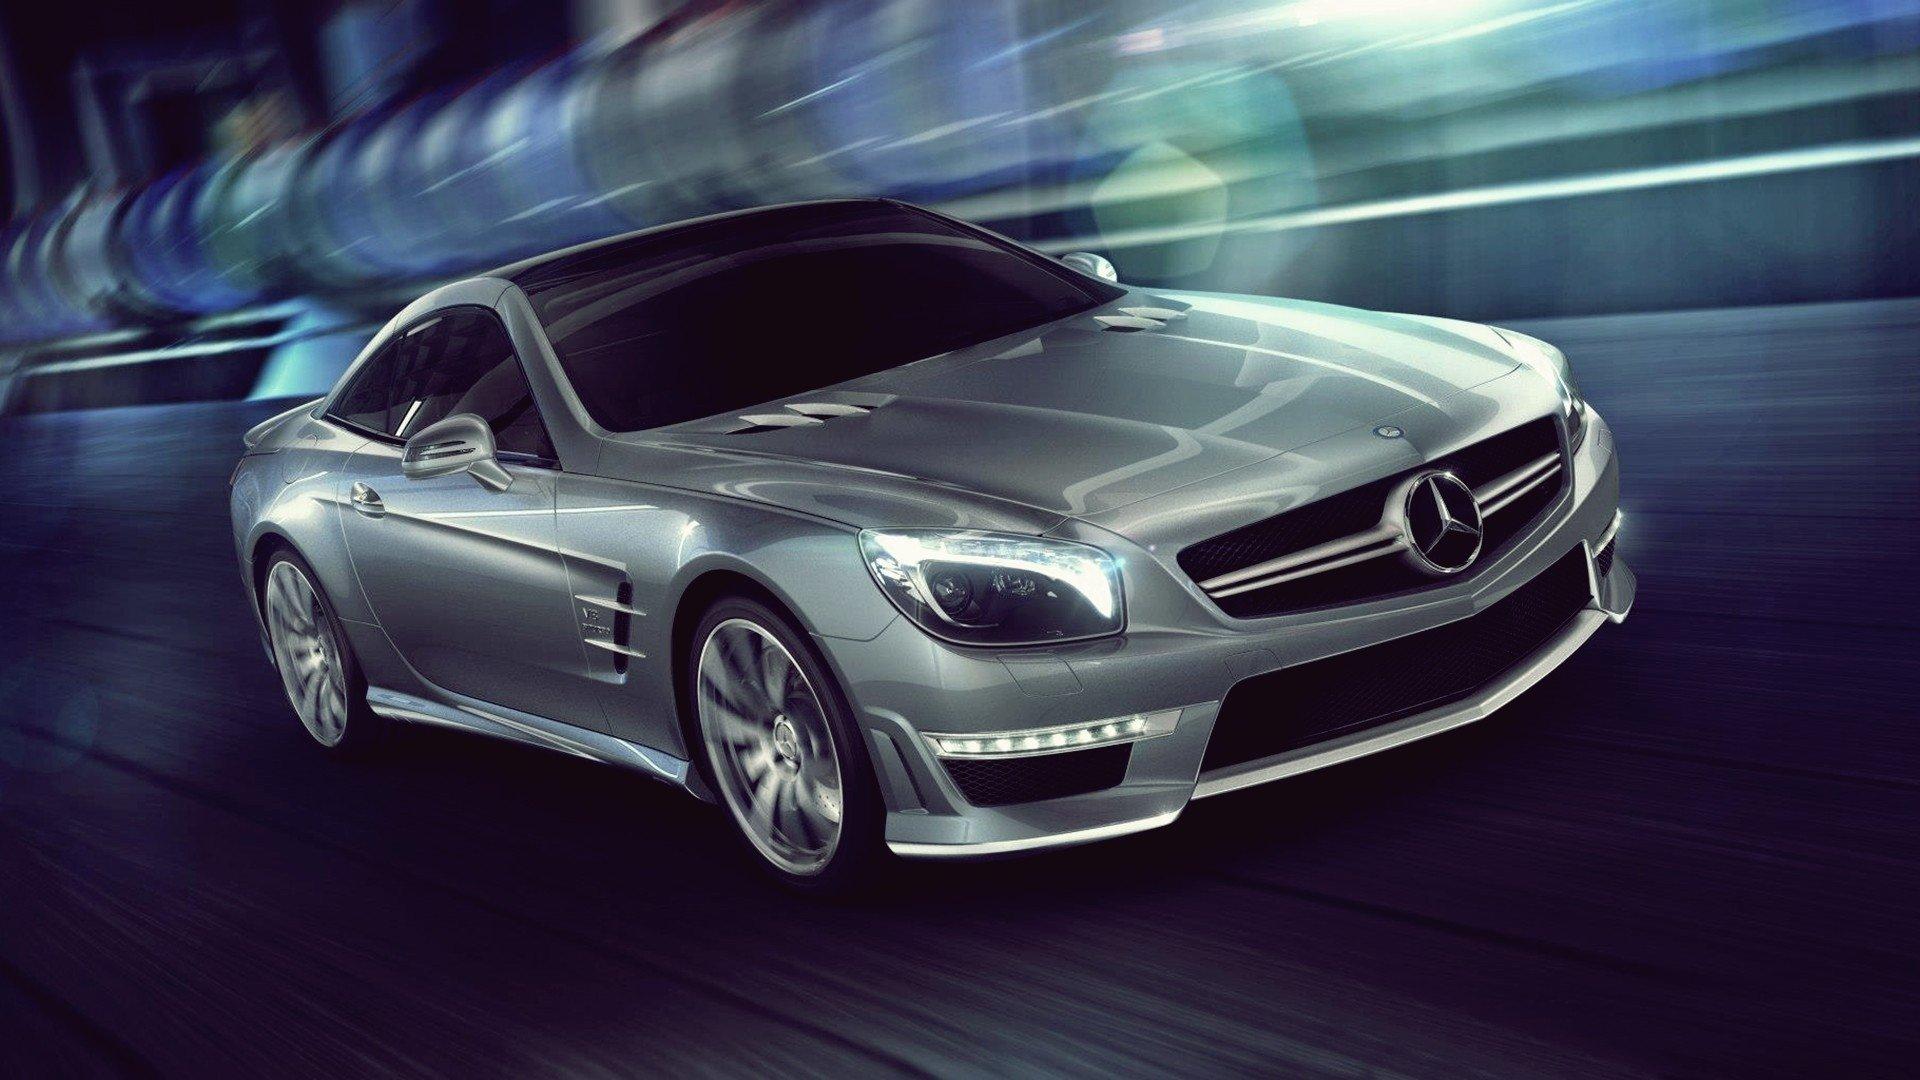 Mercedes-Benz SL 63 AMG Full HD Fond d'écran and Arrière-Plan   1920x1080   ID:350278